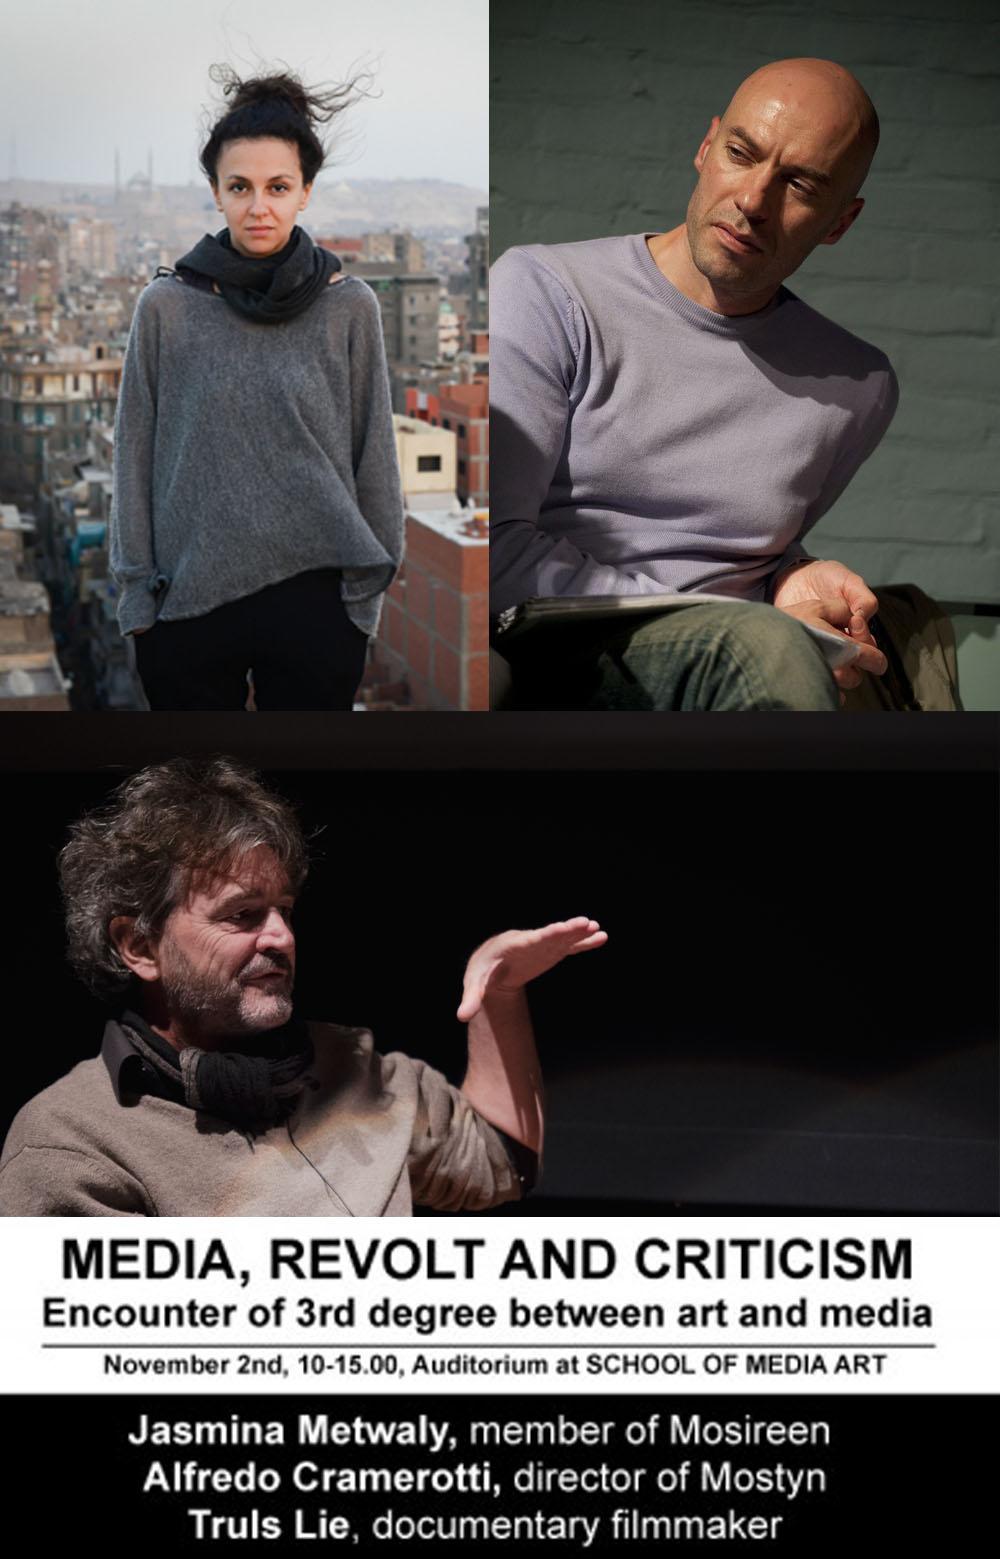 MEDIA, REVOLT AND CRITICISM – Encounter of 3rd degree between art and media